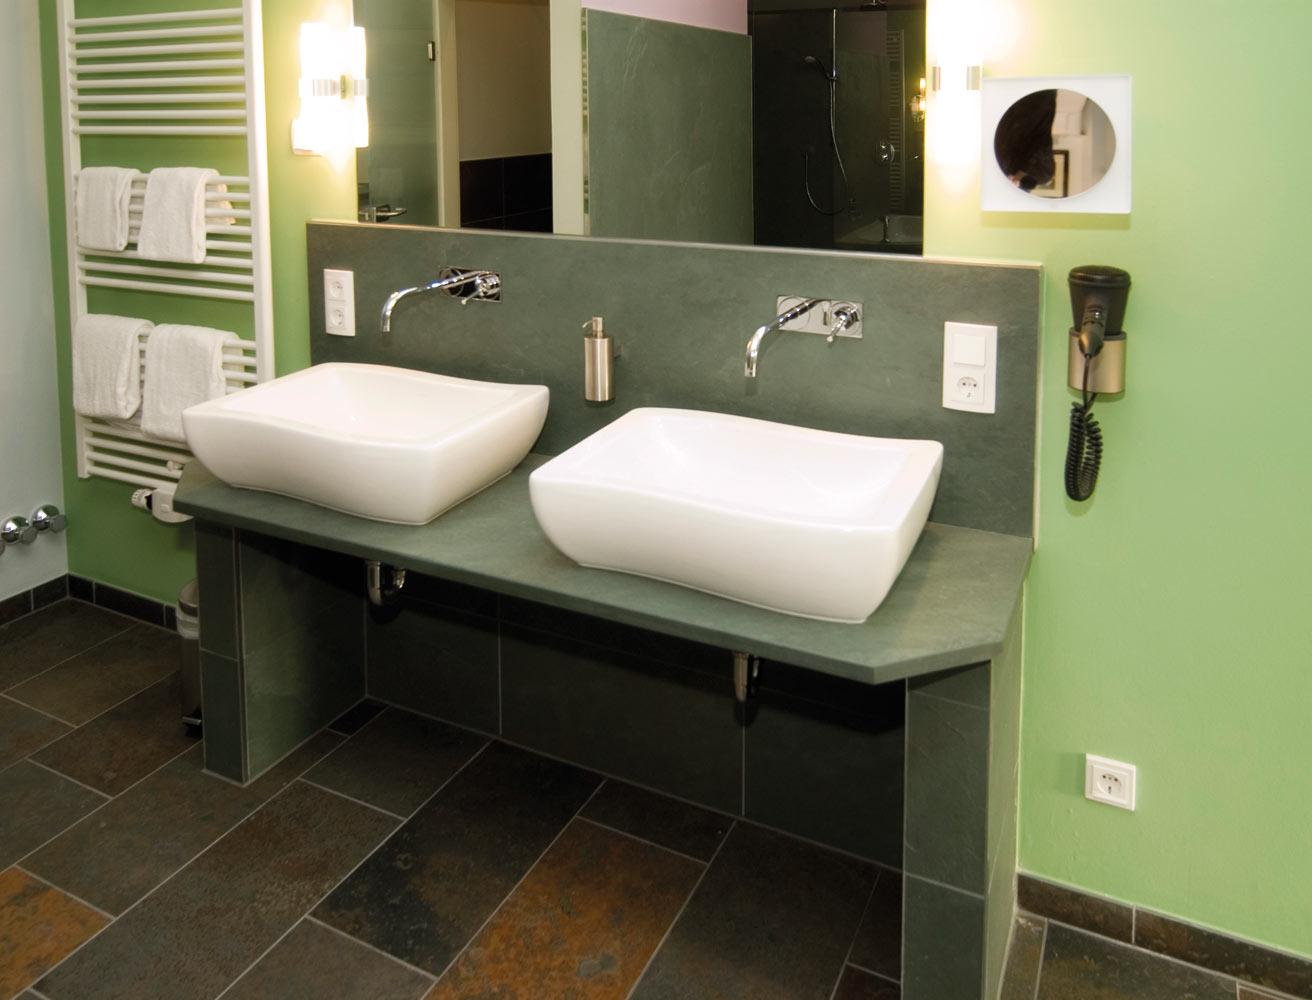 Waschtischplatte schiefer  Badgestaltung – backes